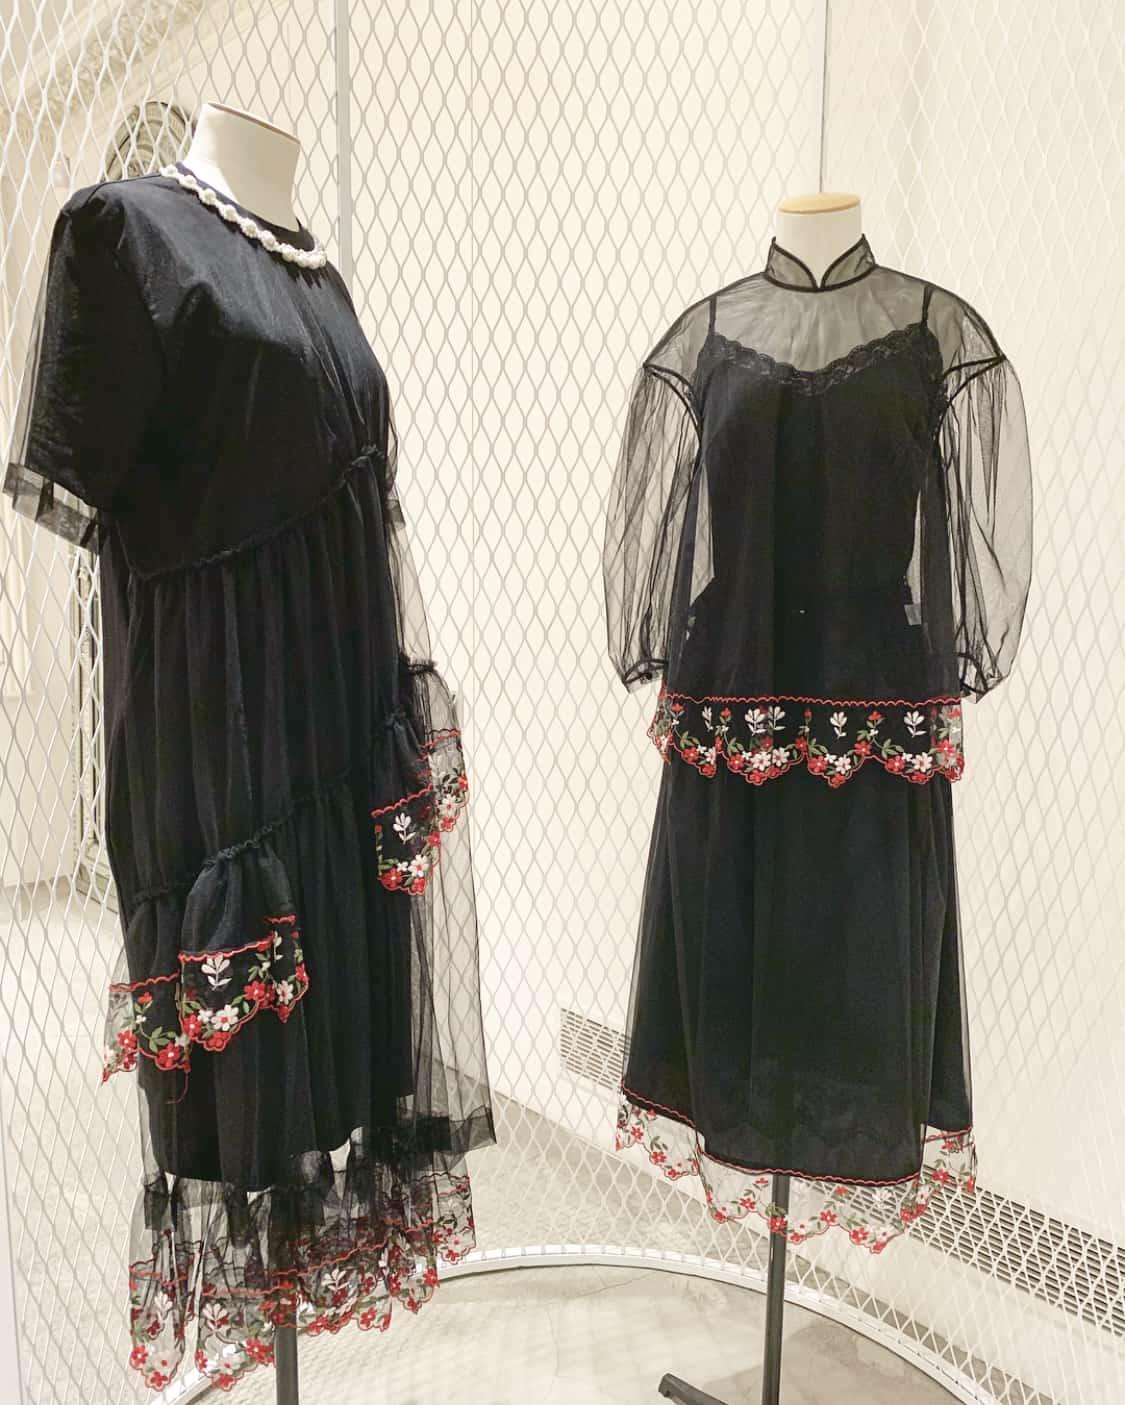 dresses by fashion designer Simone Rocha, Mount Street shop, Mayfair, Unique Boutiques tour, Ballgowns to Bumsters Tour, Latest in Design Tour, Fashion Tours London, fashion walks for fashionistas